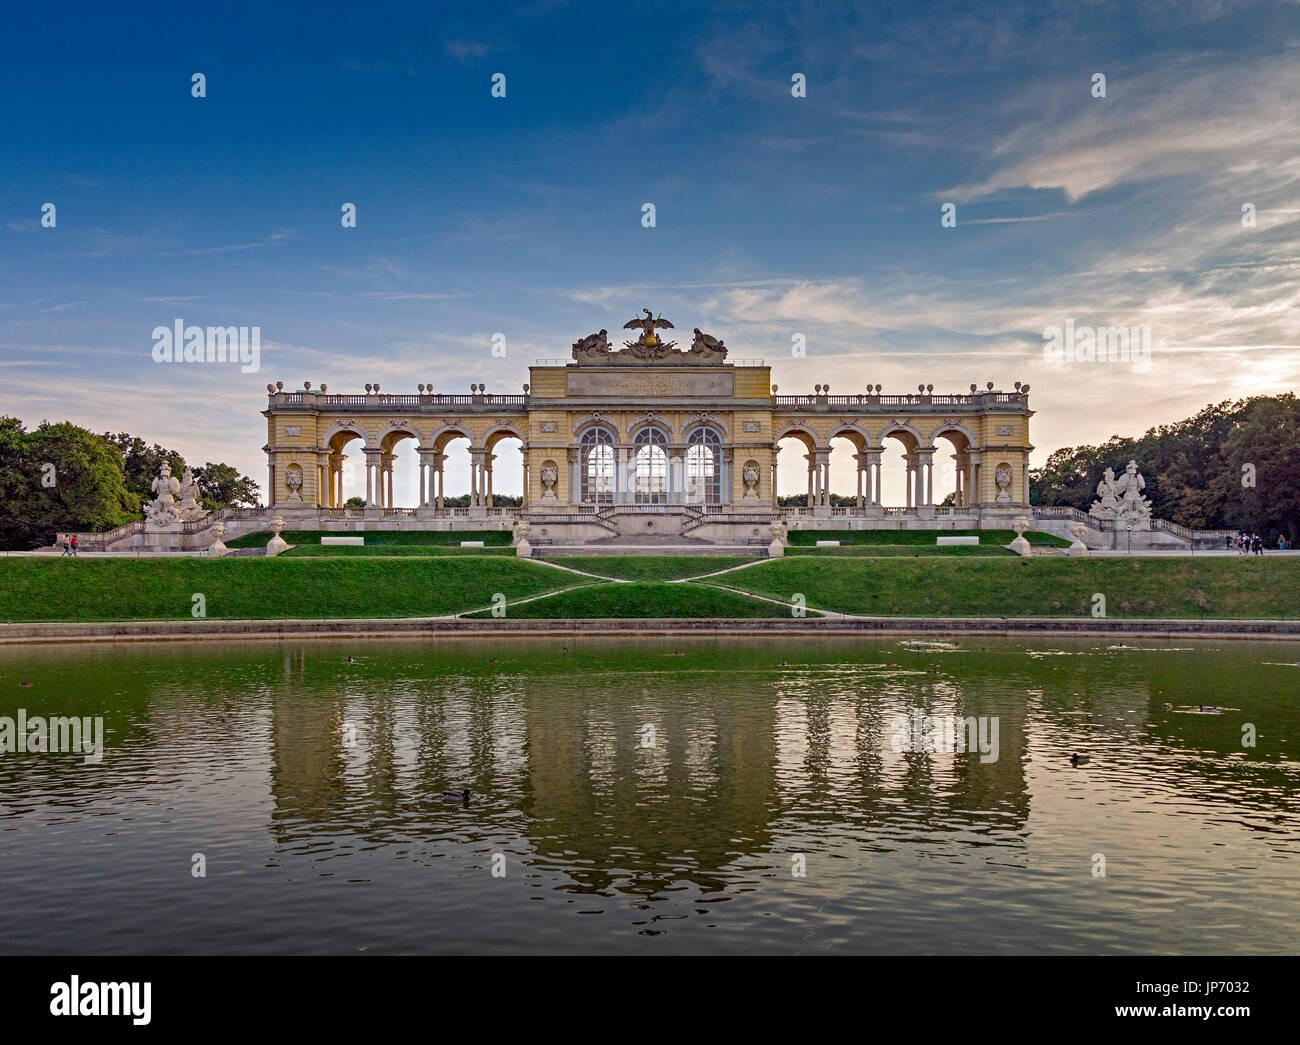 The Gloriette, Schonbrunn Palace, Vienna, Austria - Stock Image